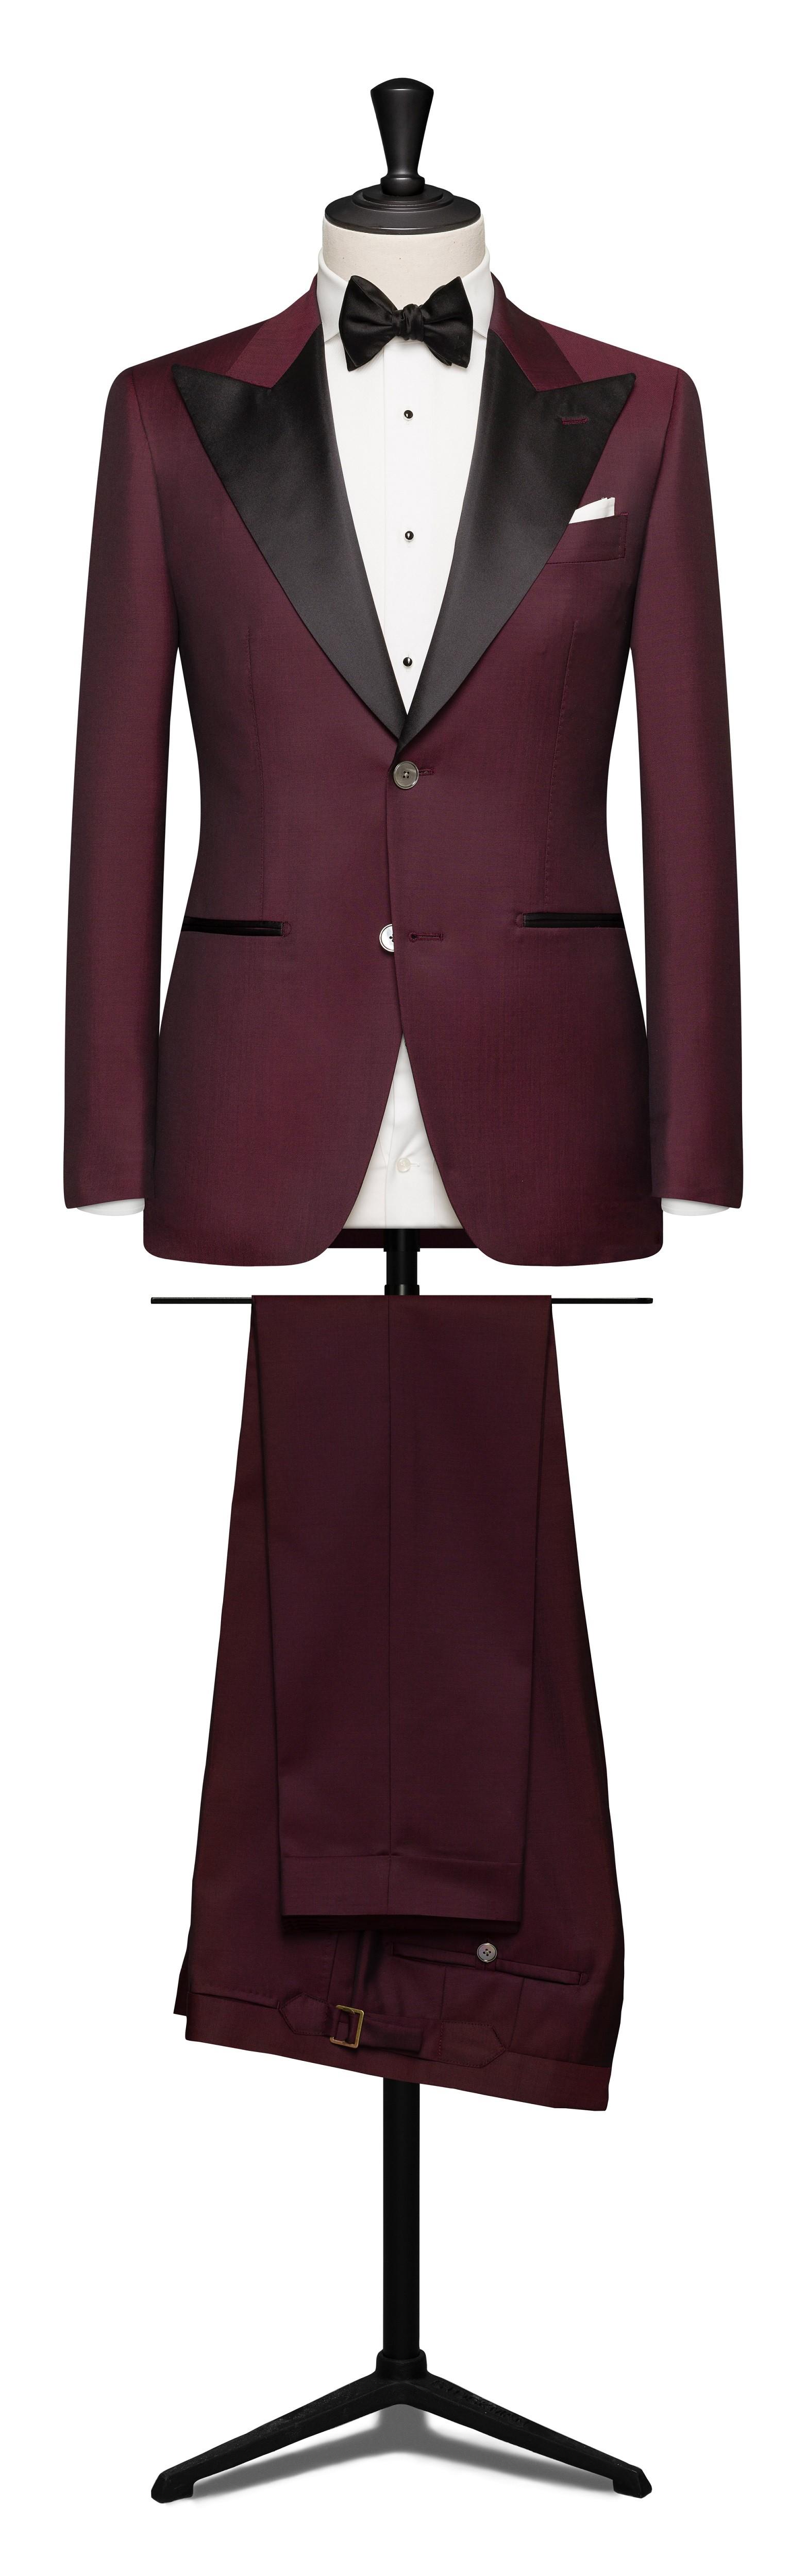 Ultimate burgundy wedding dinner suit